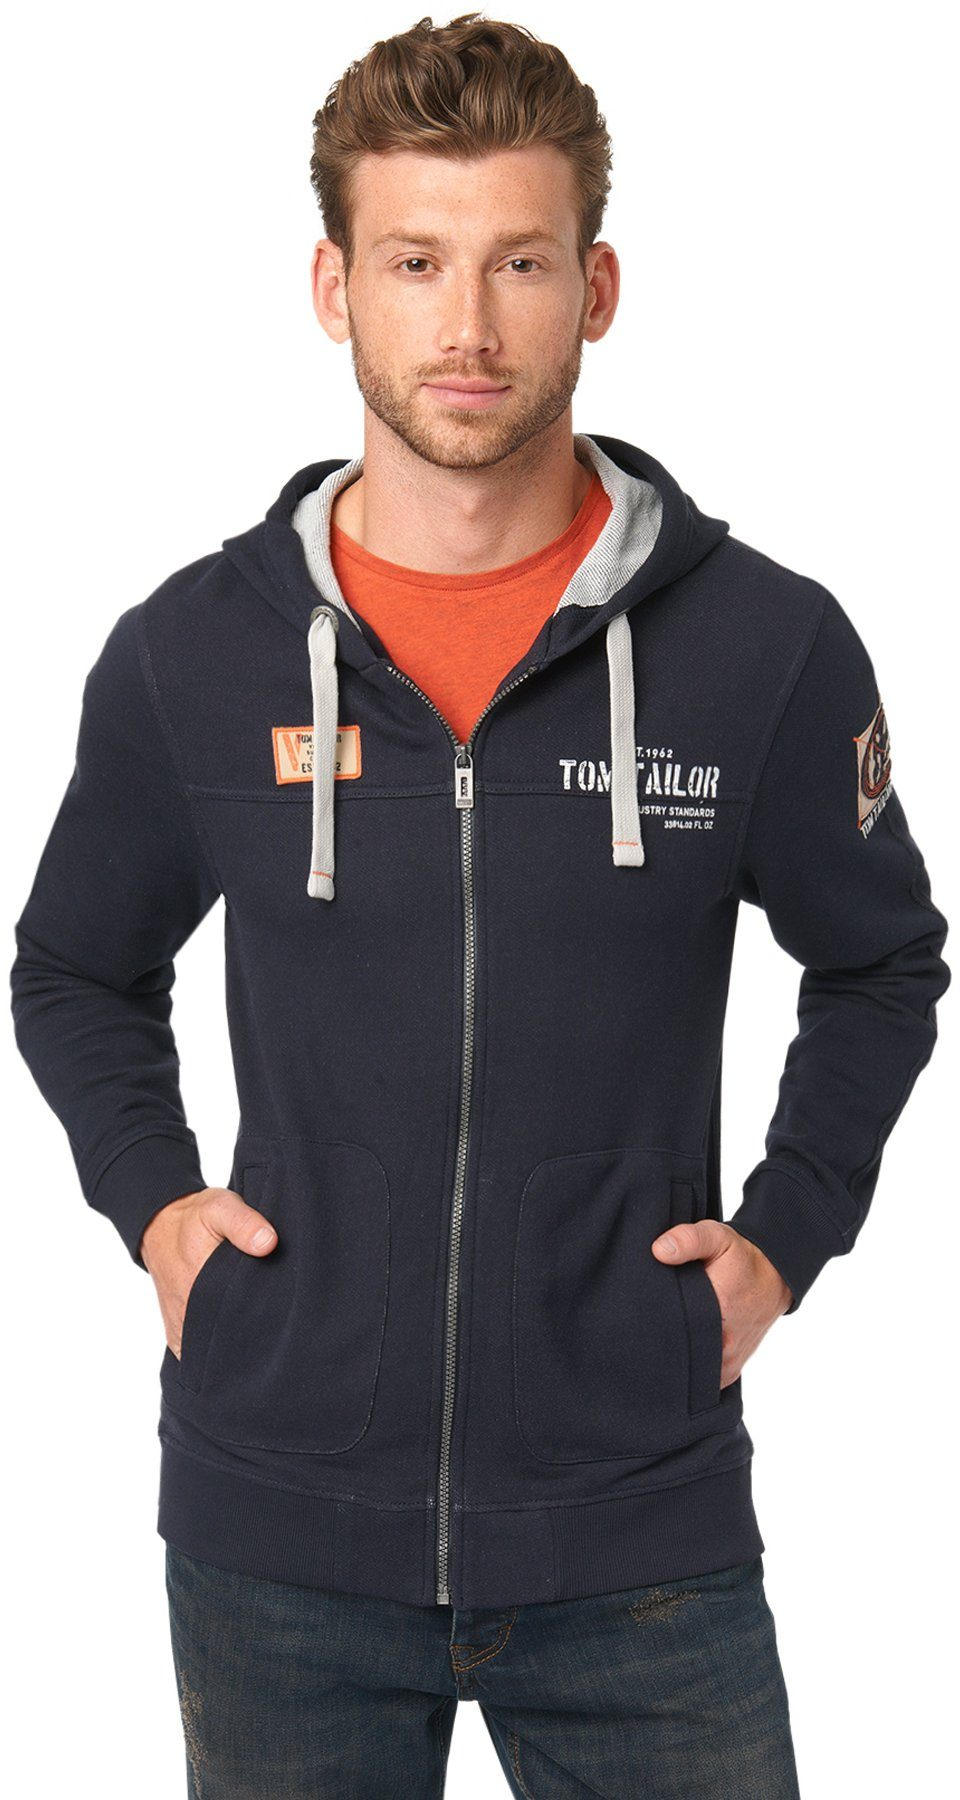 TOM TAILOR Sweatjacke »Sweatjacke mit Print und Badges«